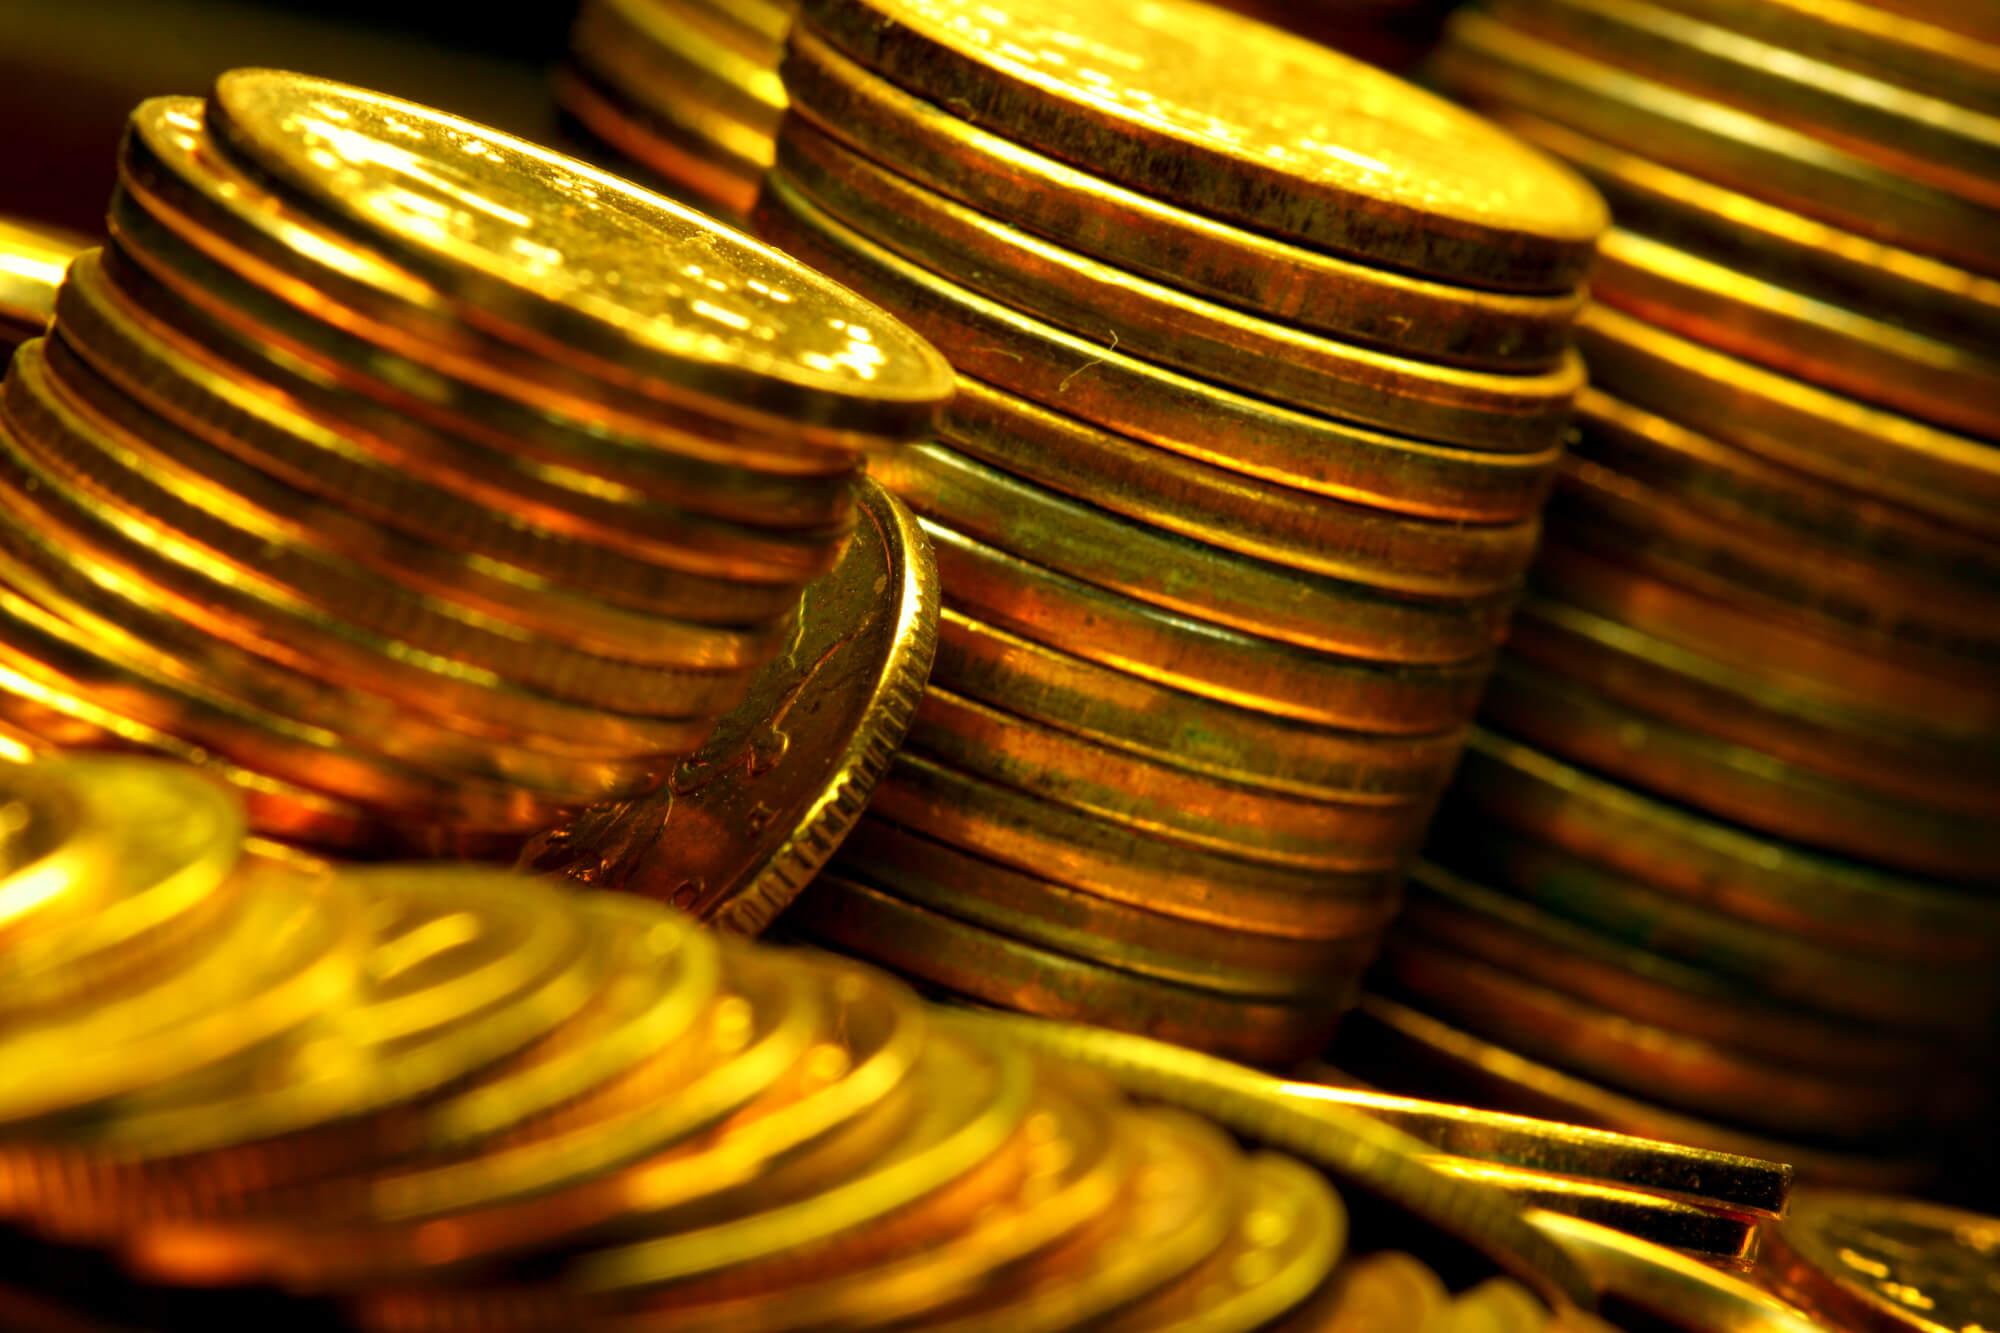 where can i shop gold coins west palm beach?